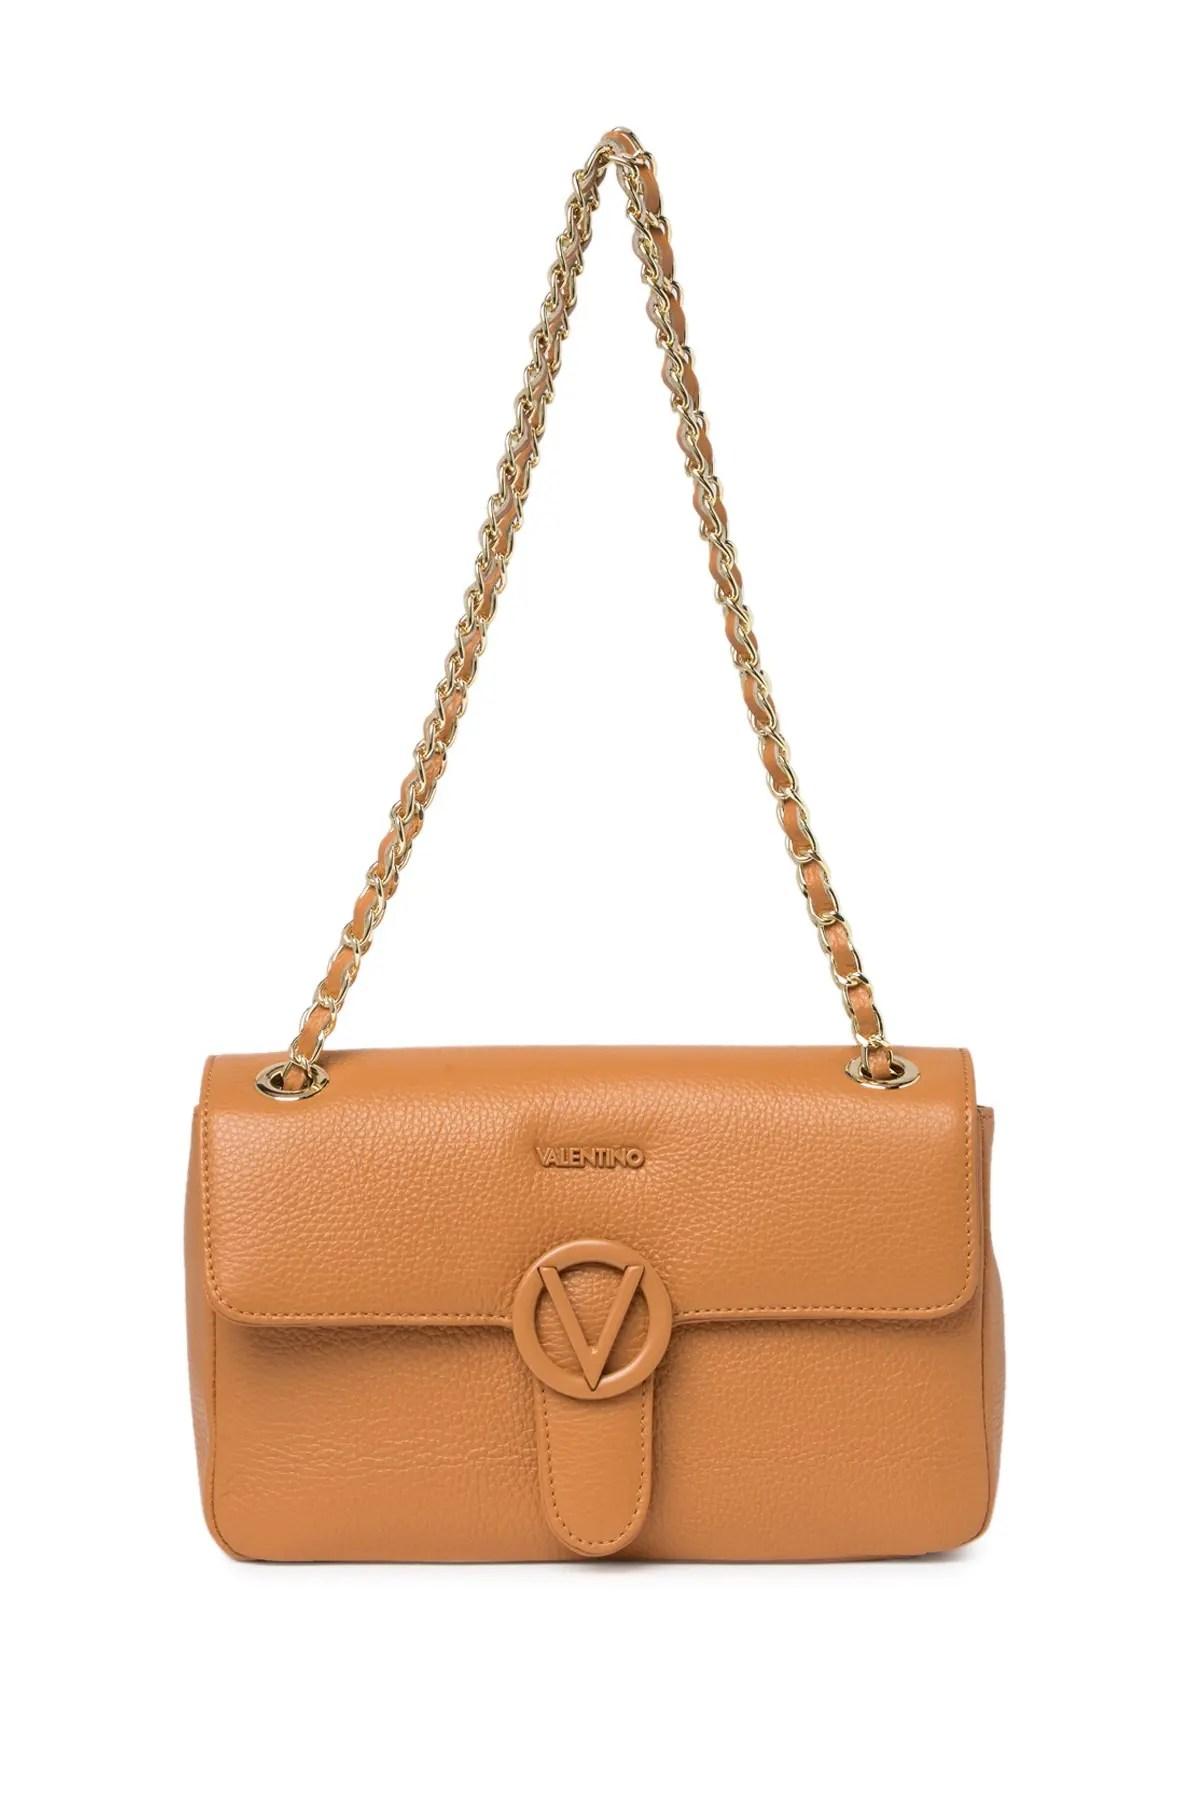 valentino by mario valentino antoinette dollaro classic braided shoulder handbag nordstrom rack